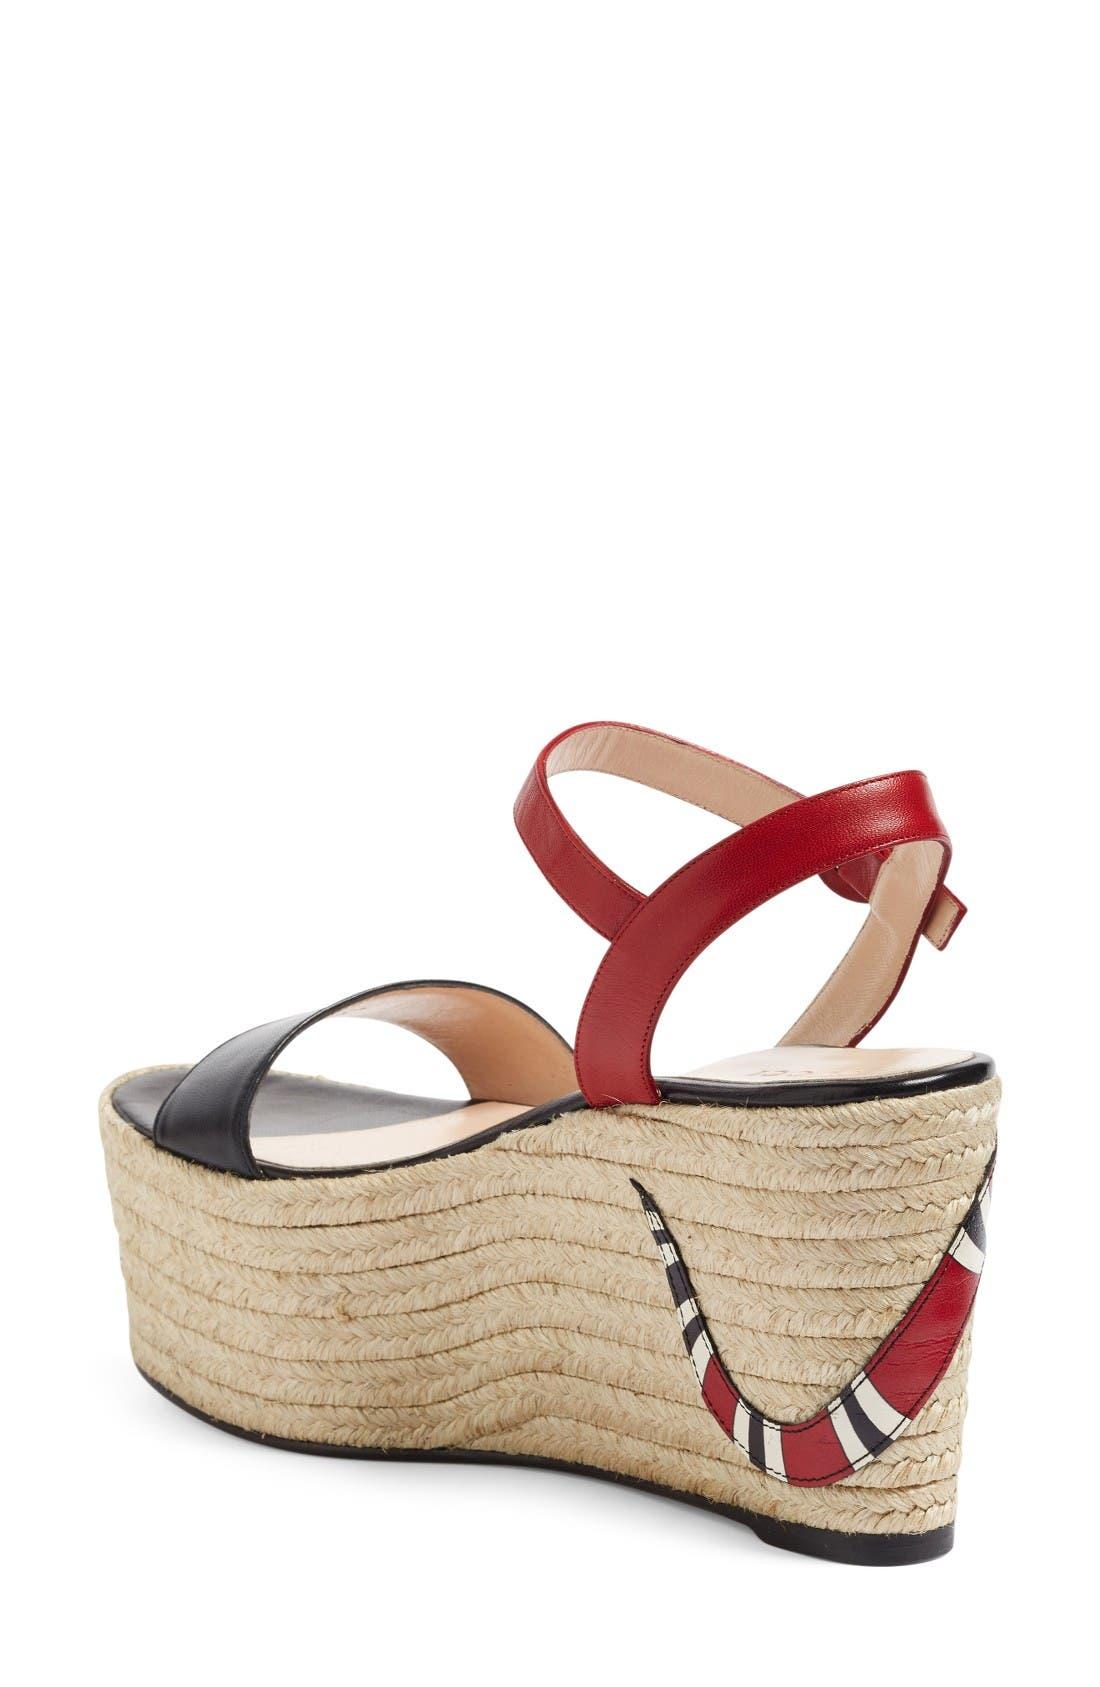 Alternate Image 2  - Gucci Barbette Espadrille Wedge Sandal (Women)